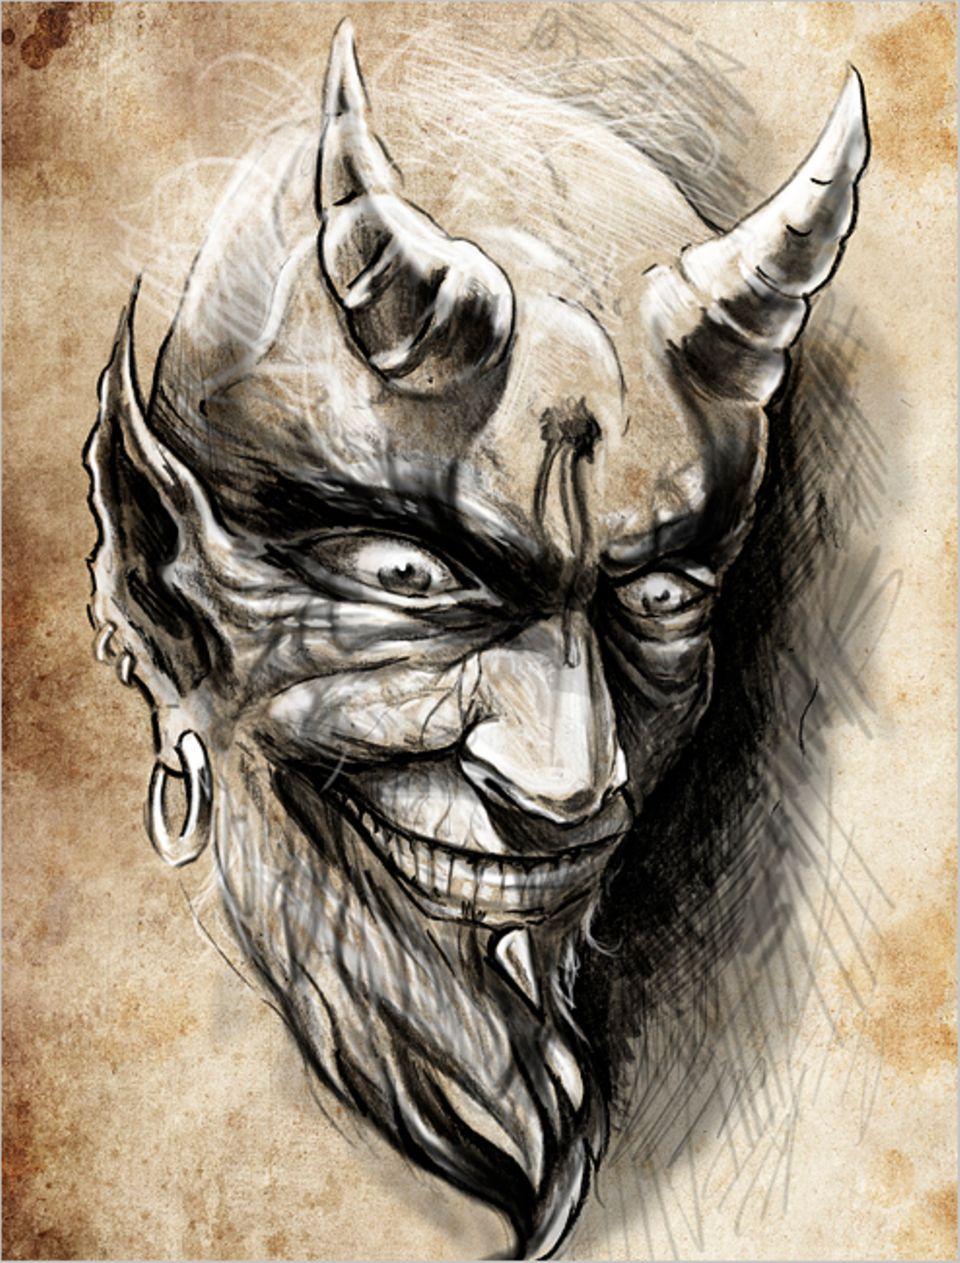 Redewendung: Den Teufel an die Wand malen